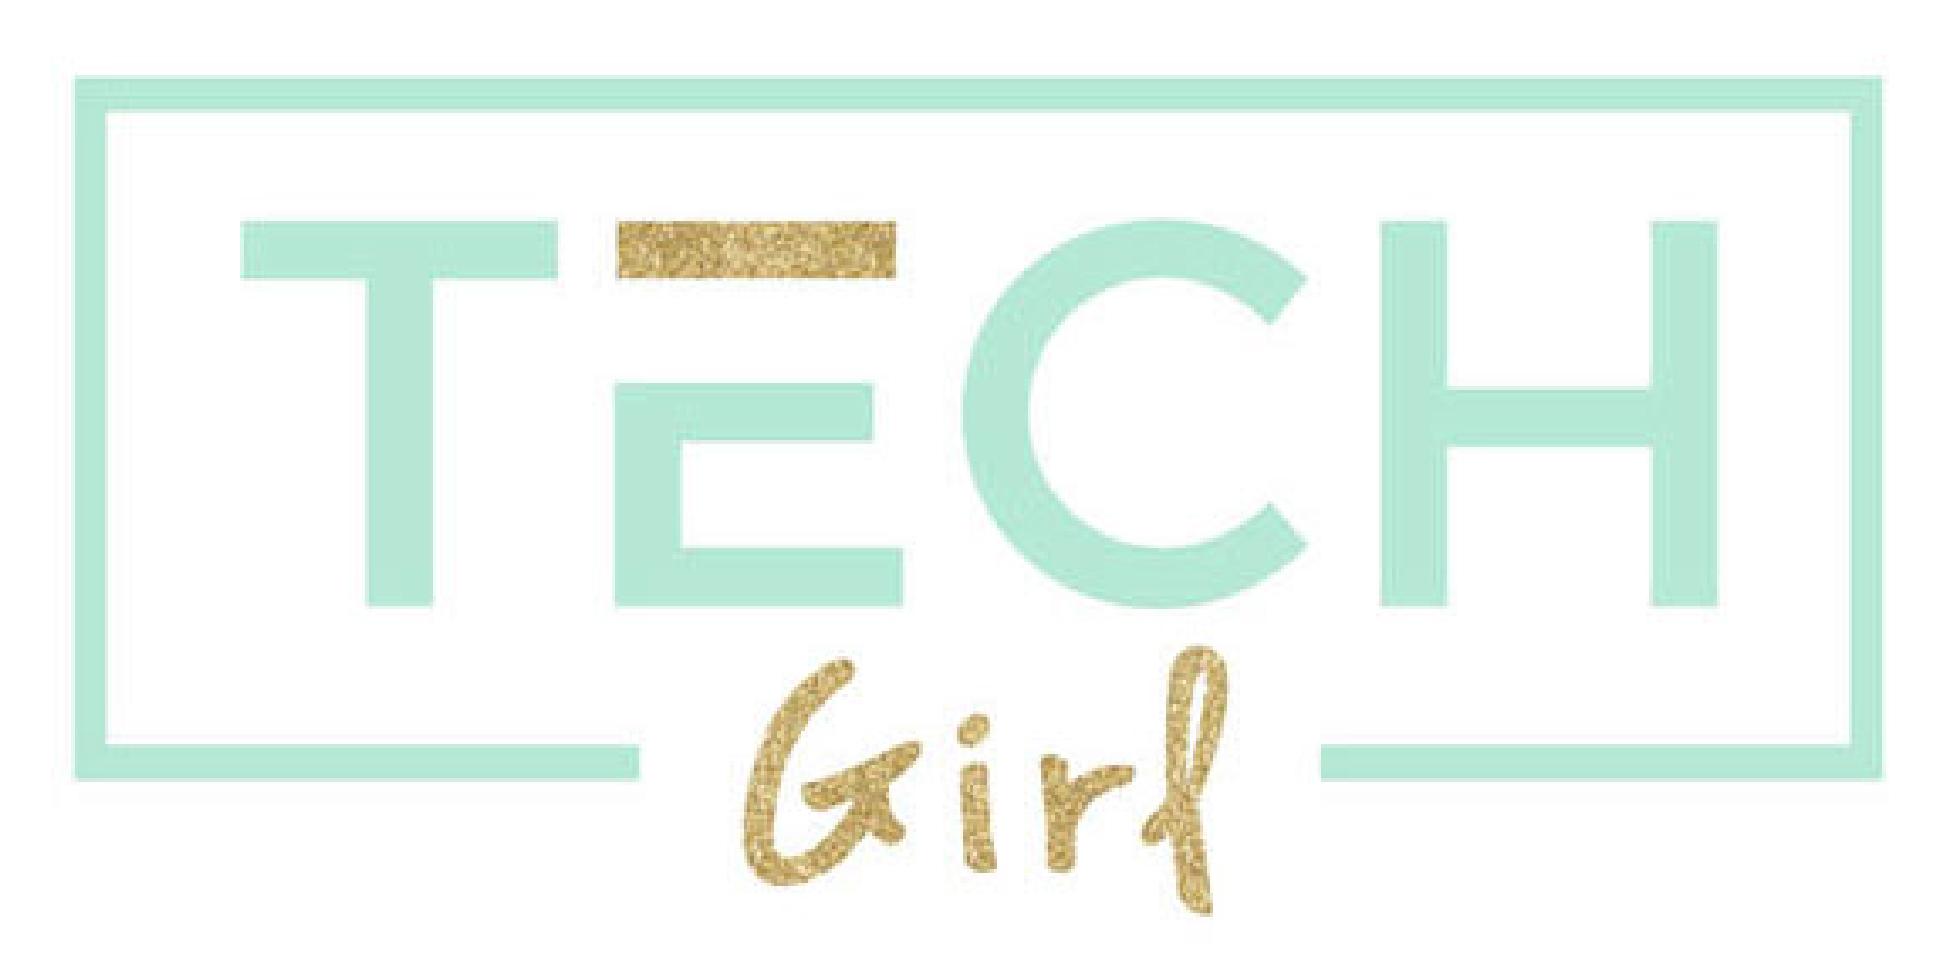 techgirl_banner_edit.jpg